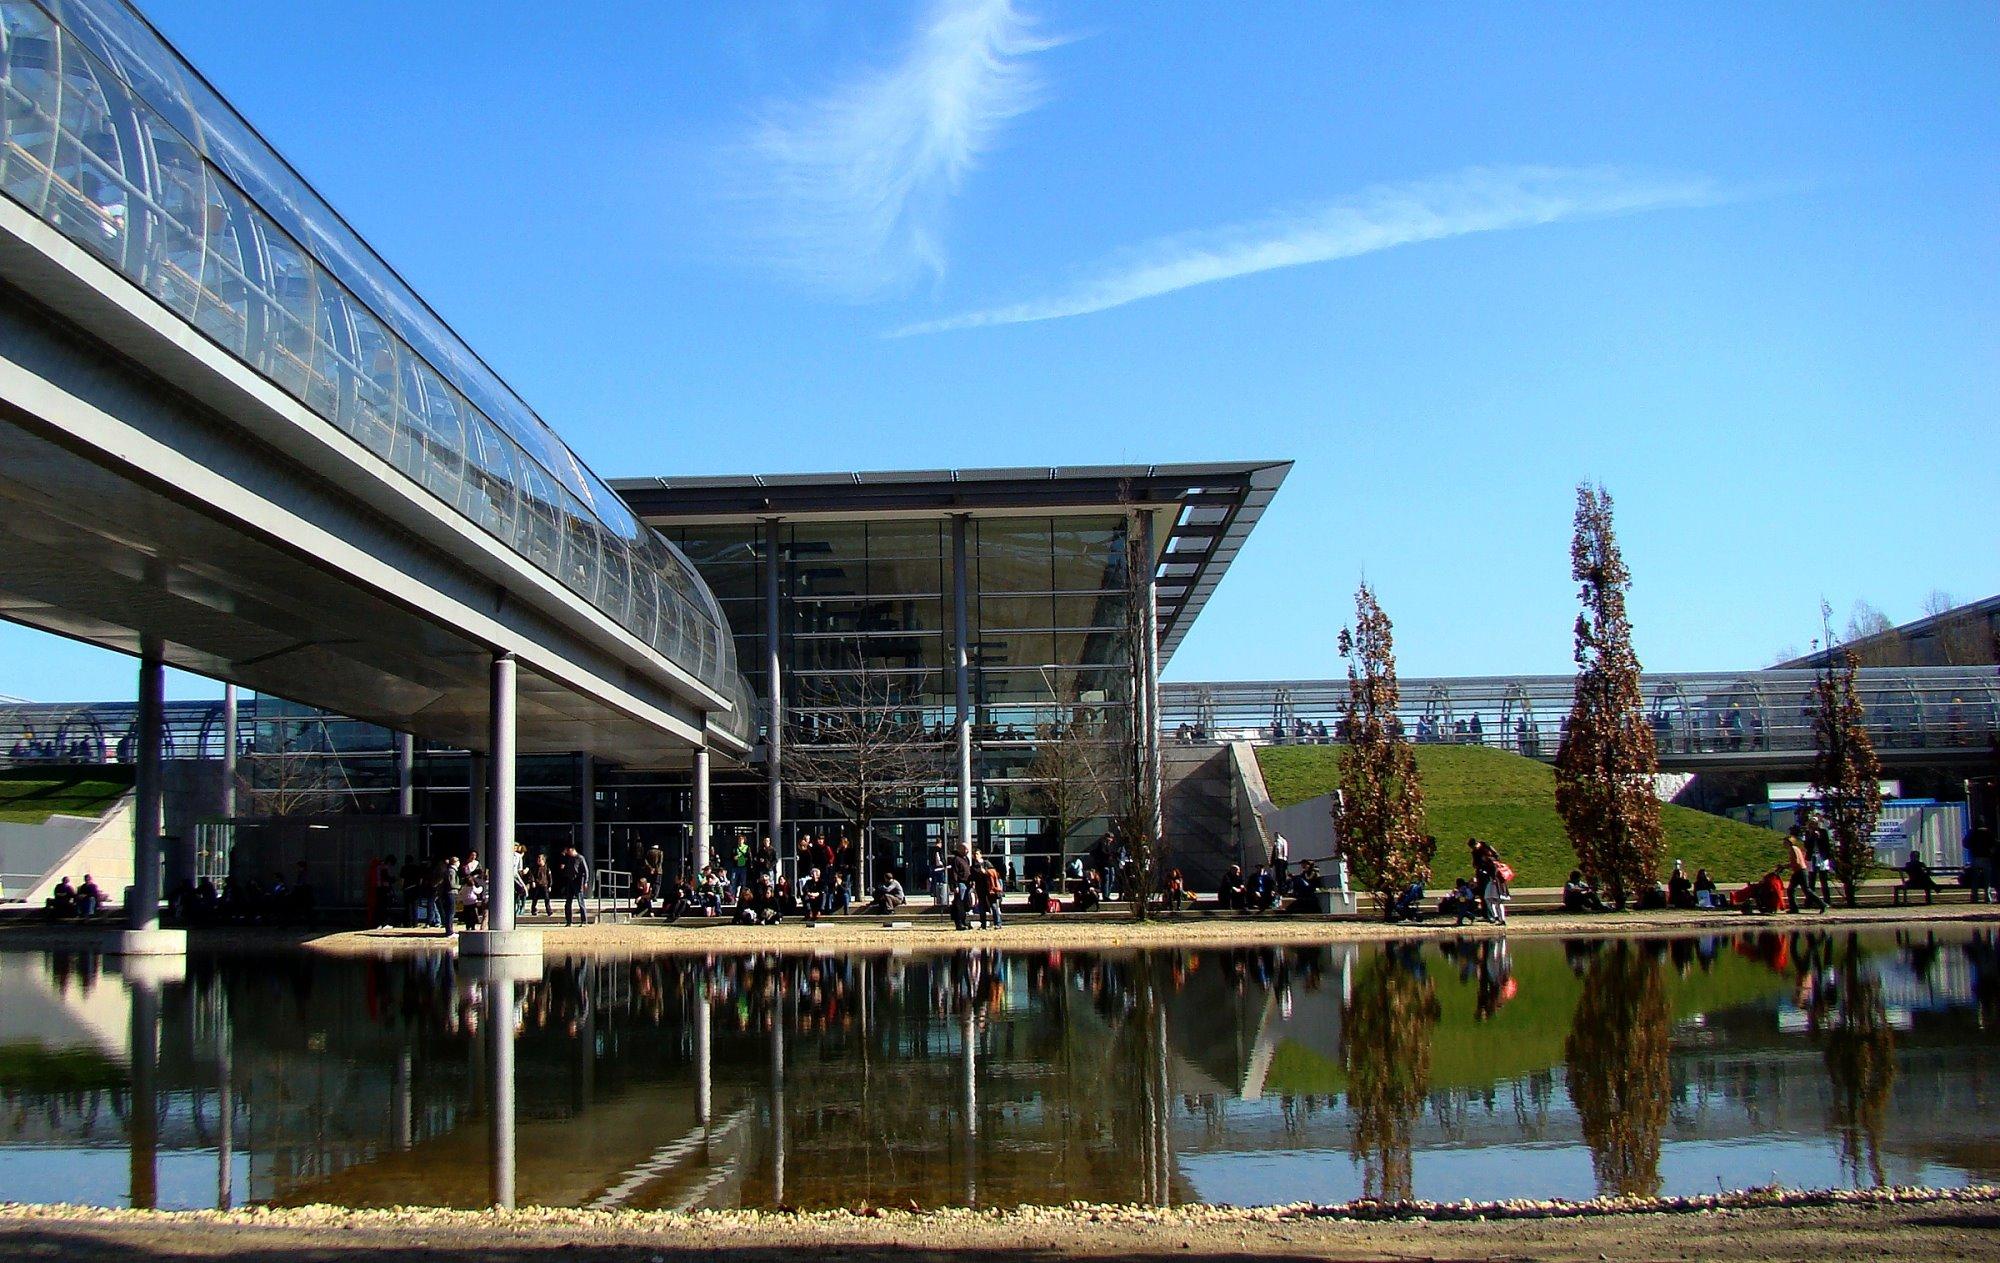 File:Leipzig Messe Eingang Ost 2.jpg - Wikimedia Commons